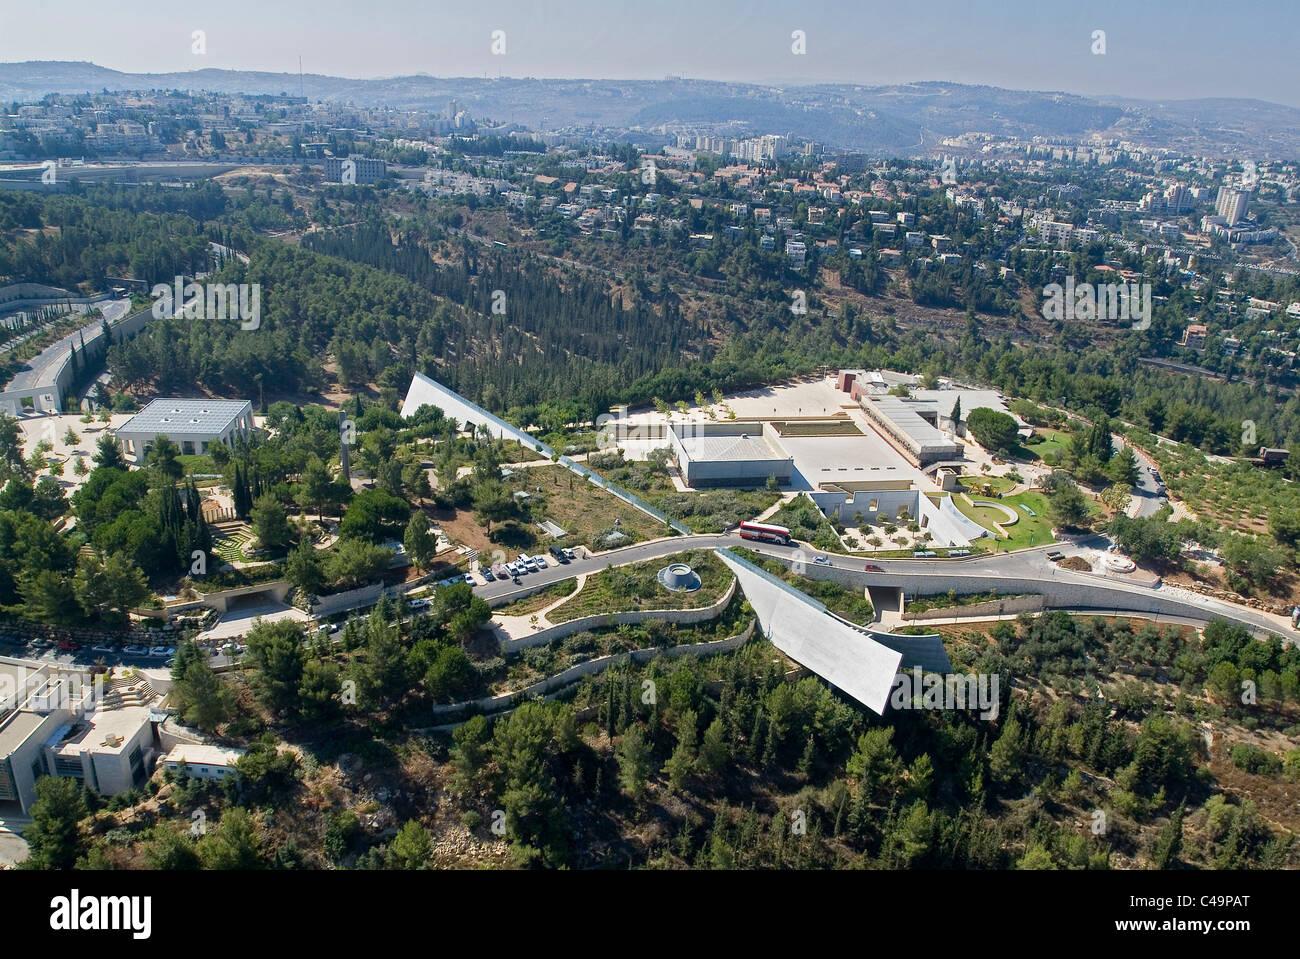 Aerial photograph of Yad VaShem in Western Jerusalem - Stock Image